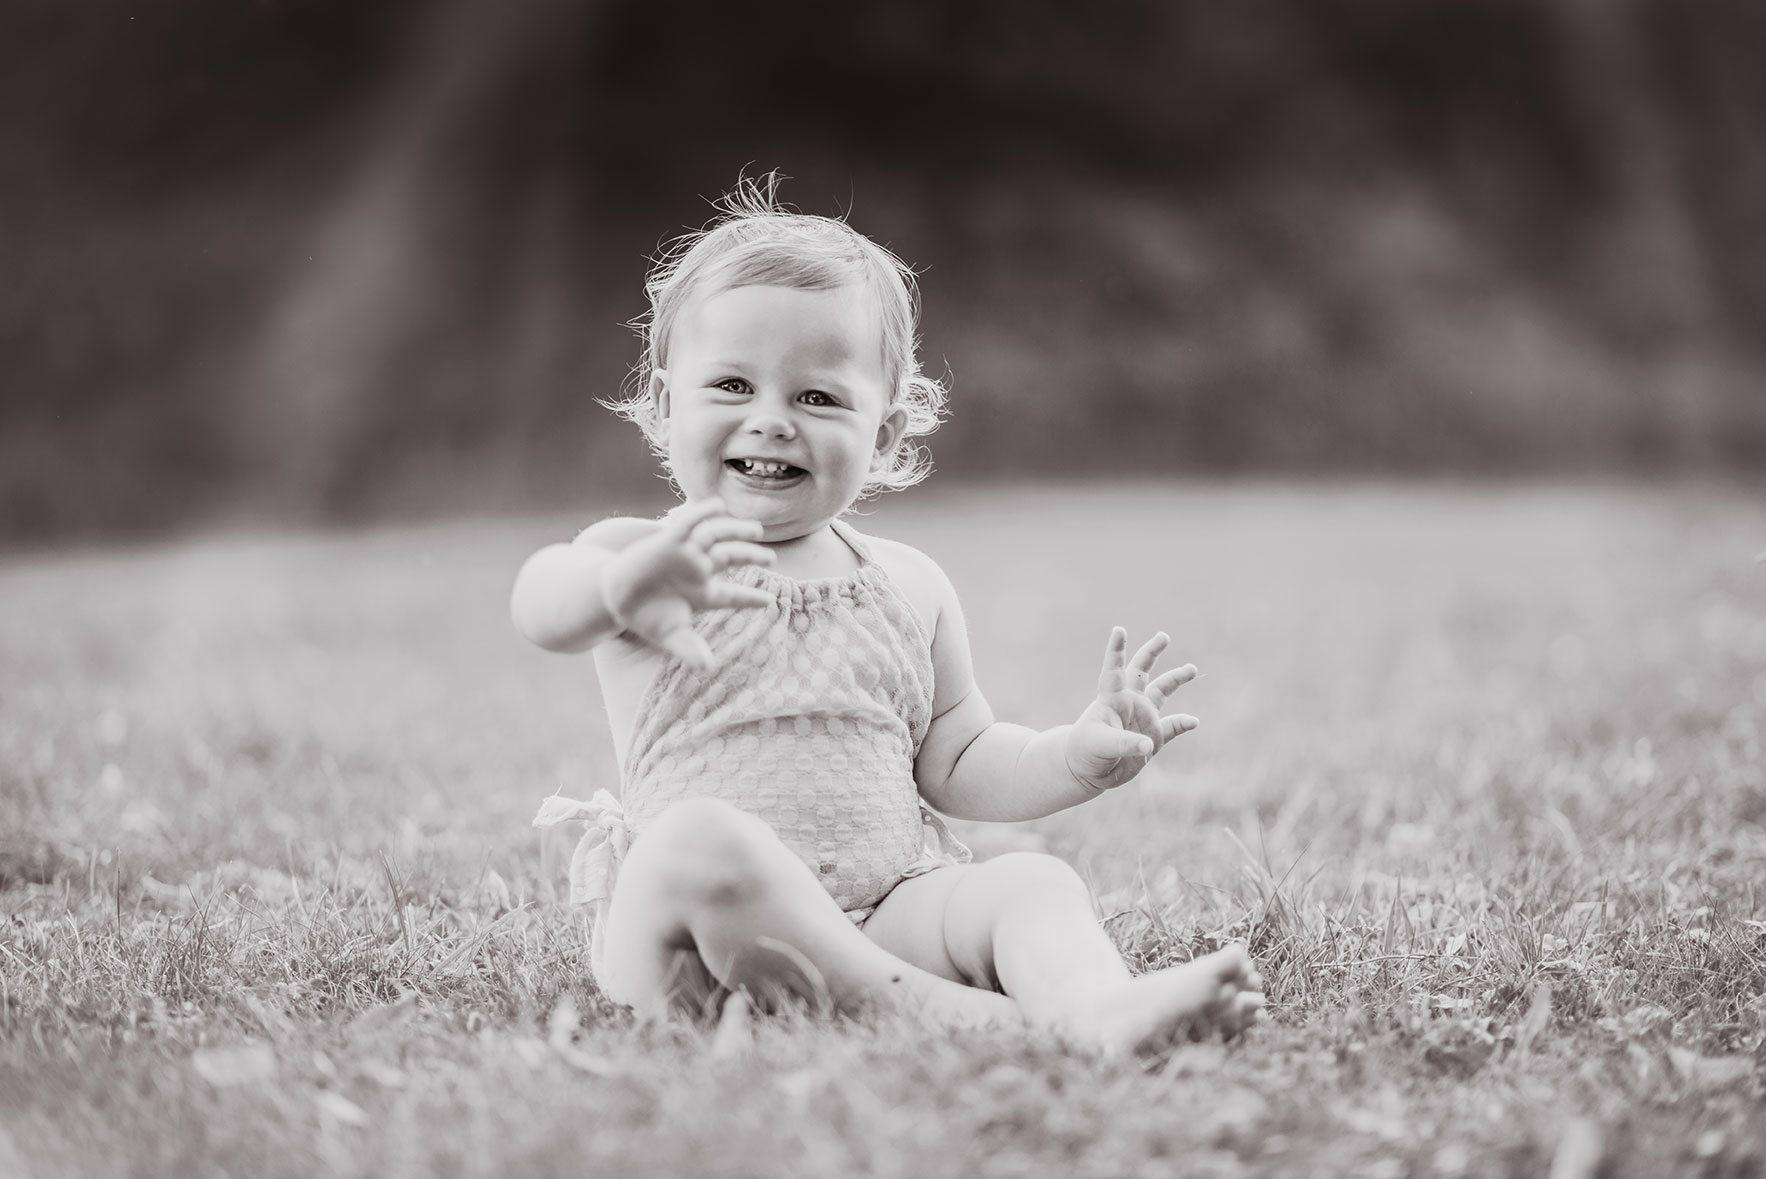 Outdoor child photographer.